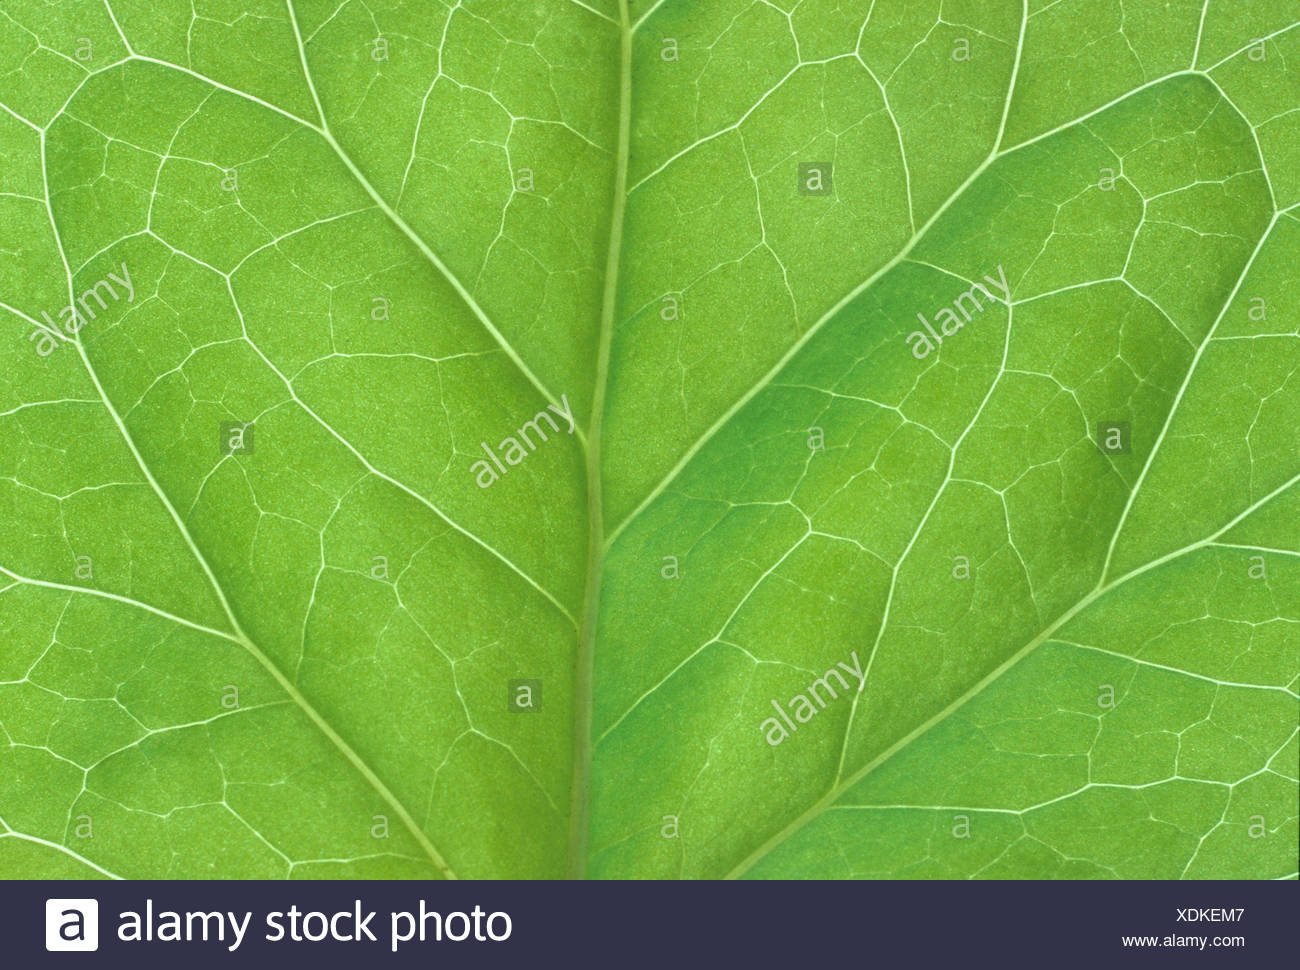 bilaterally symmetrical ivy leaf - Stock Image